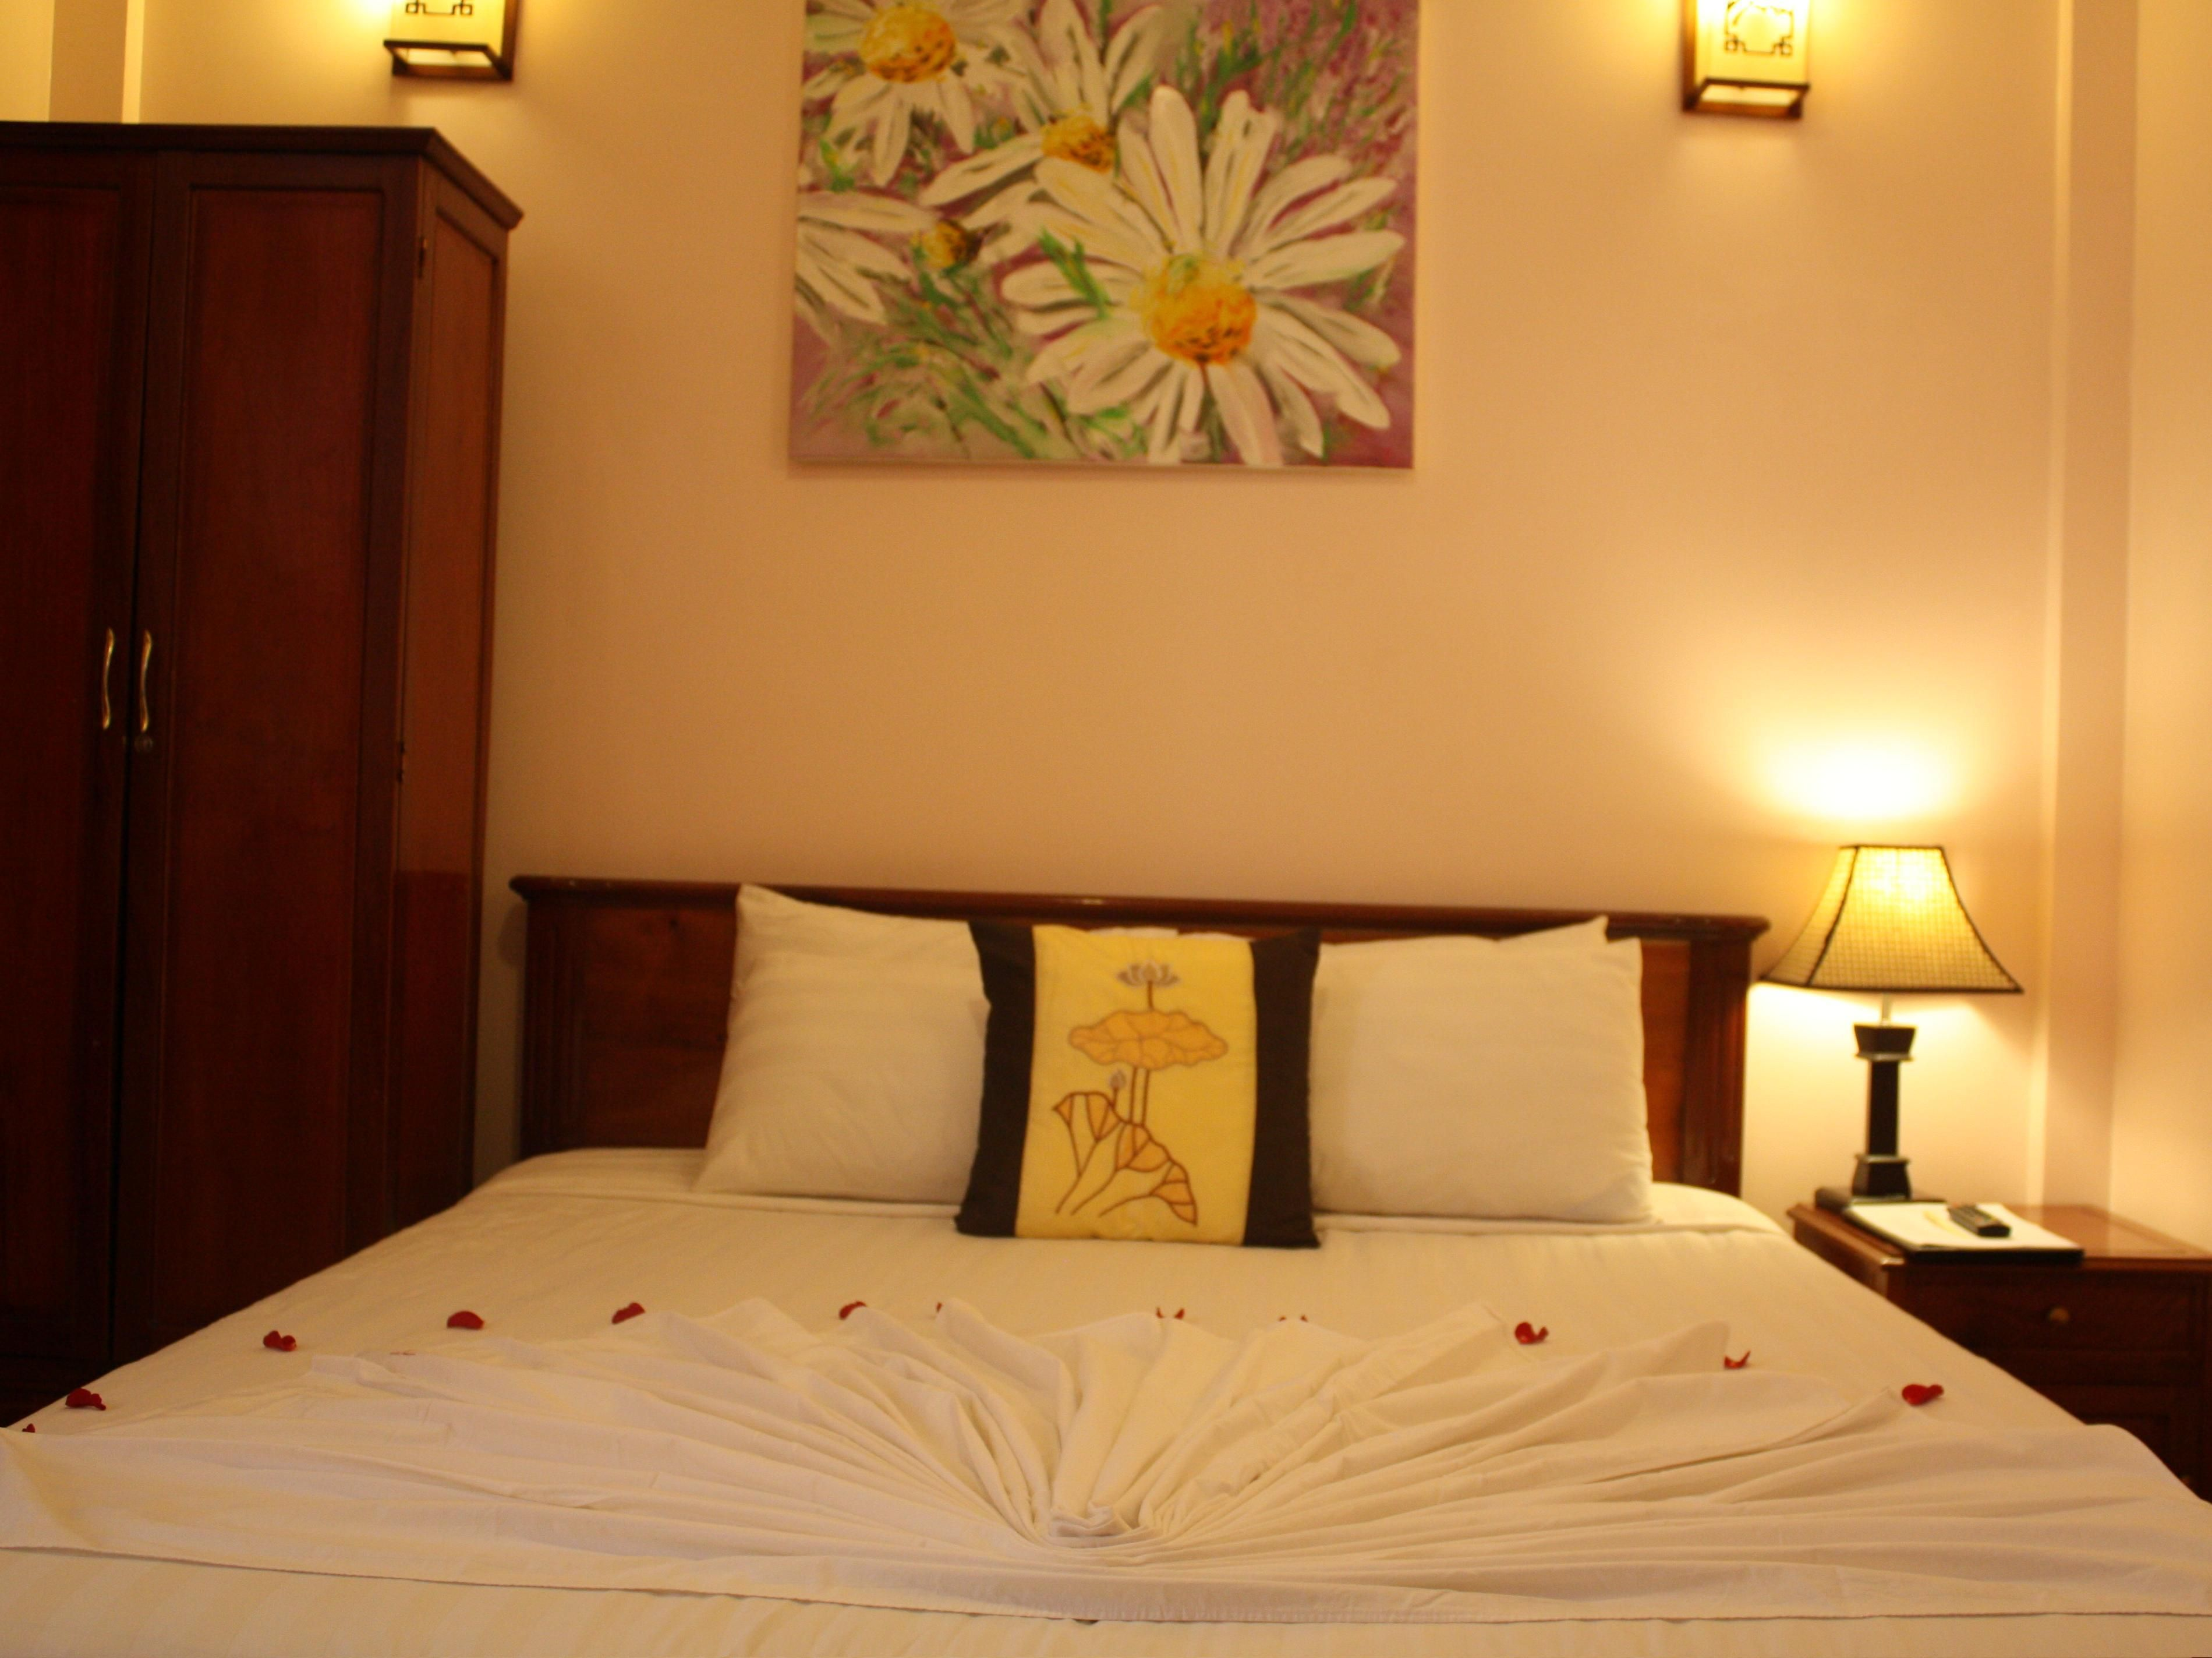 Holiday Diamond Hotel Hue, Vietnam